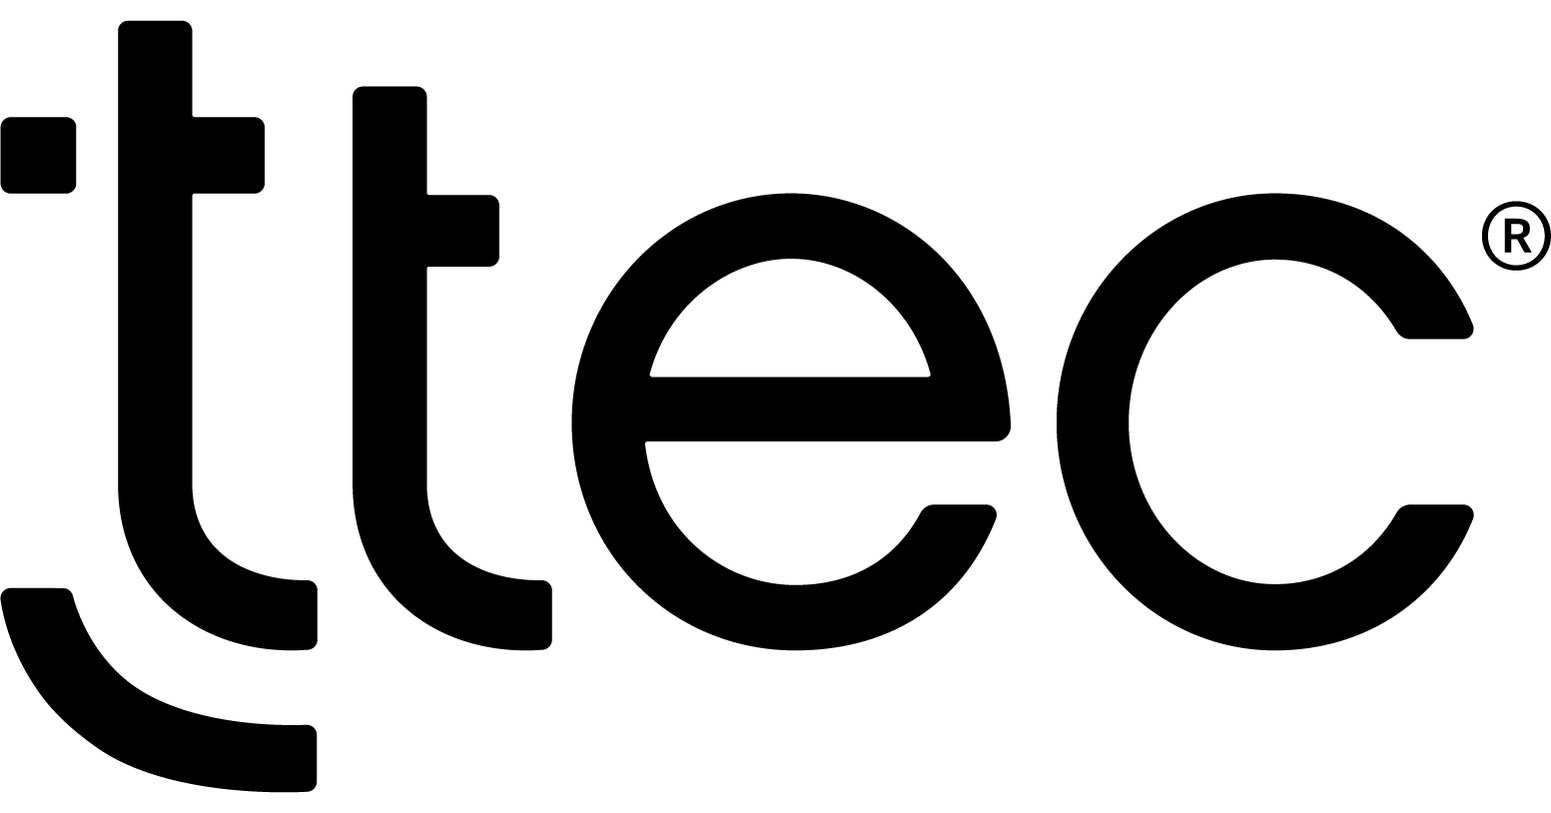 teletech logo jpg?p=facebook.'